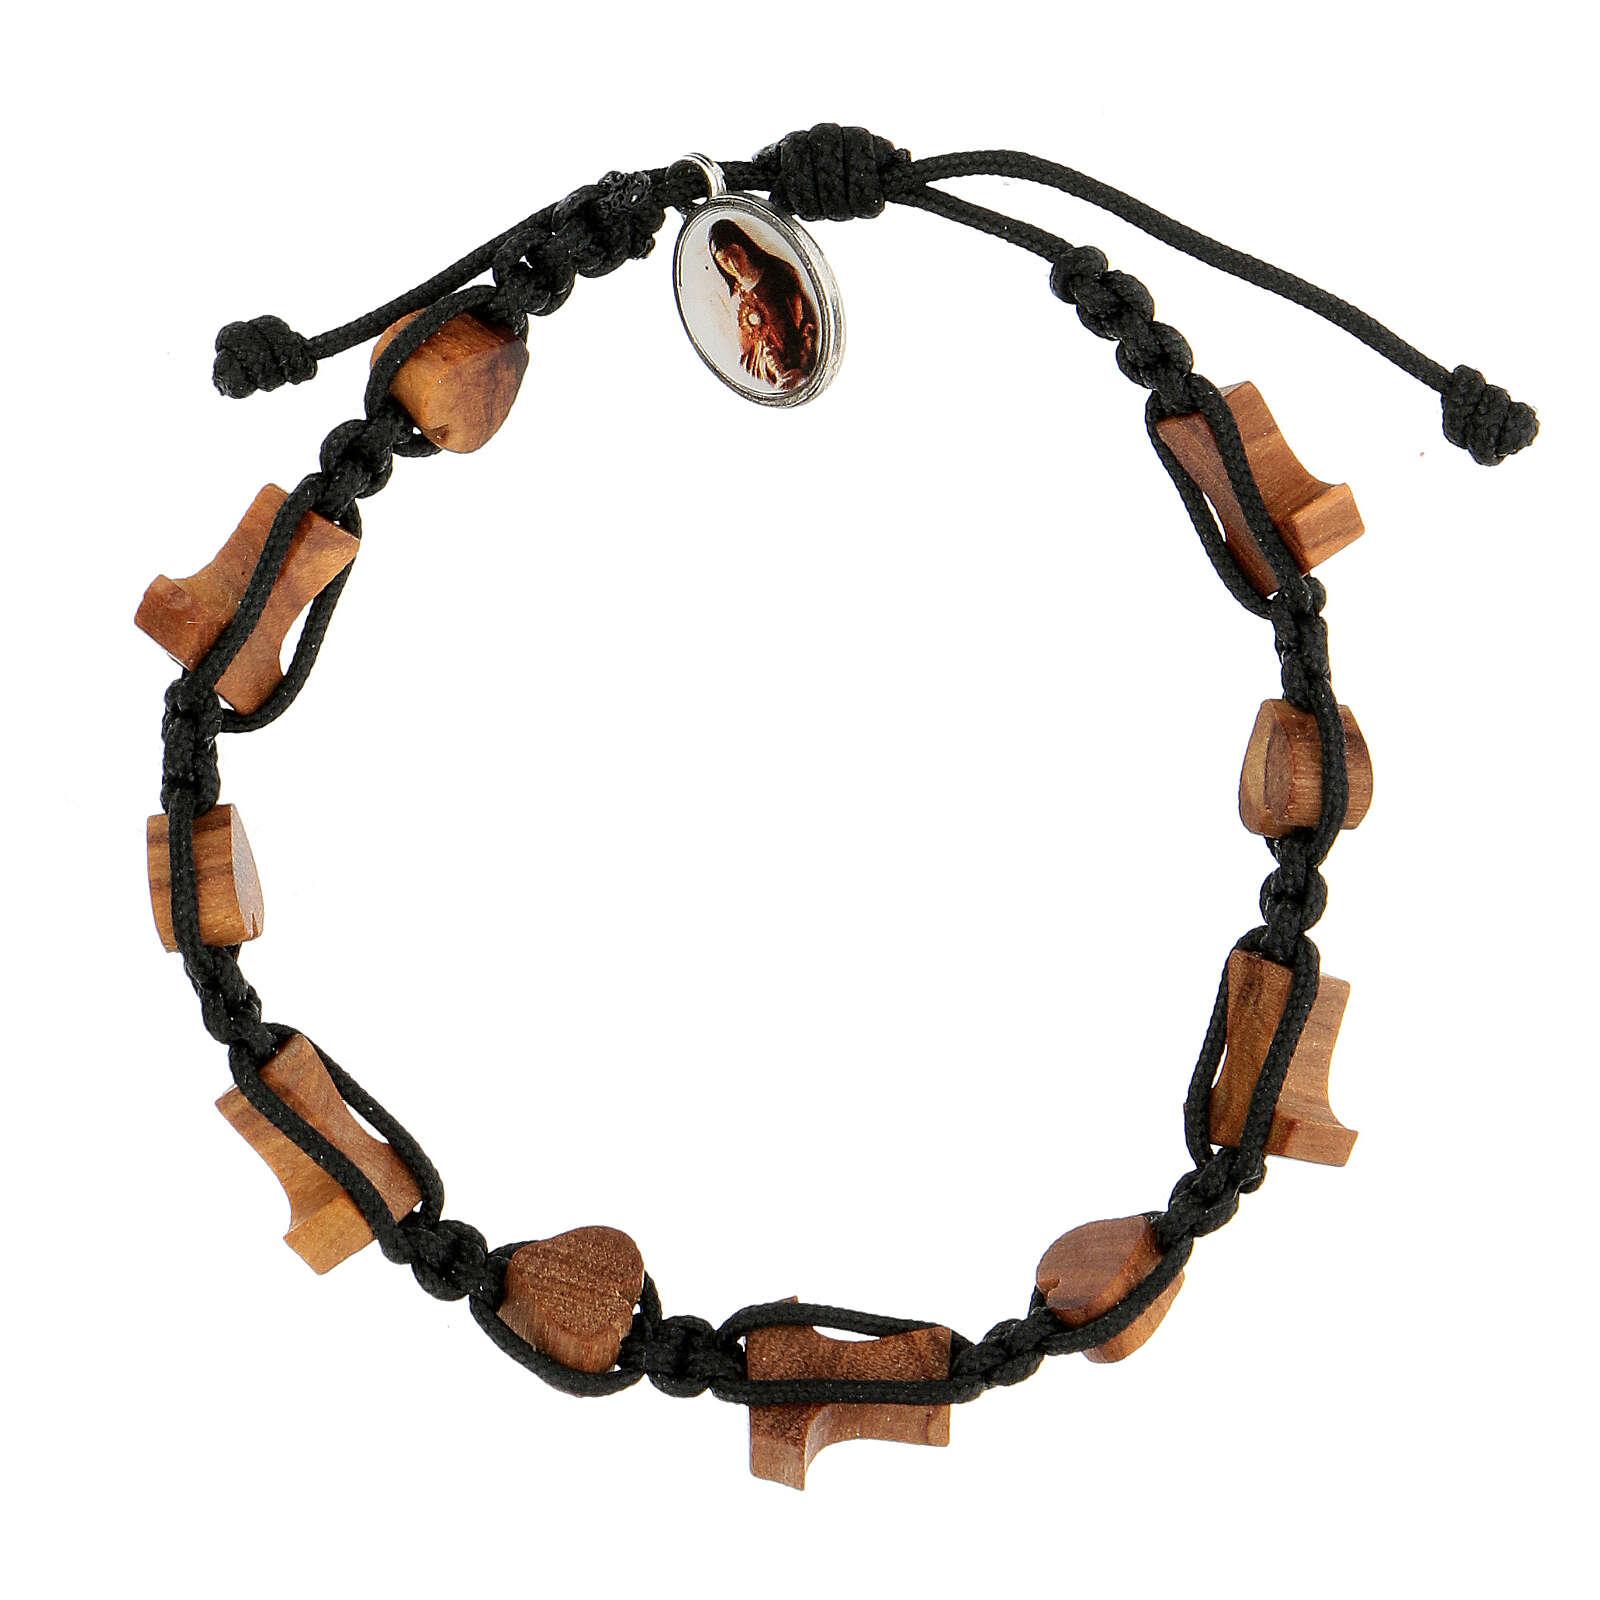 Handmade Medjugorje bracelet made of hearts and tau crosses in olive tree wood 4